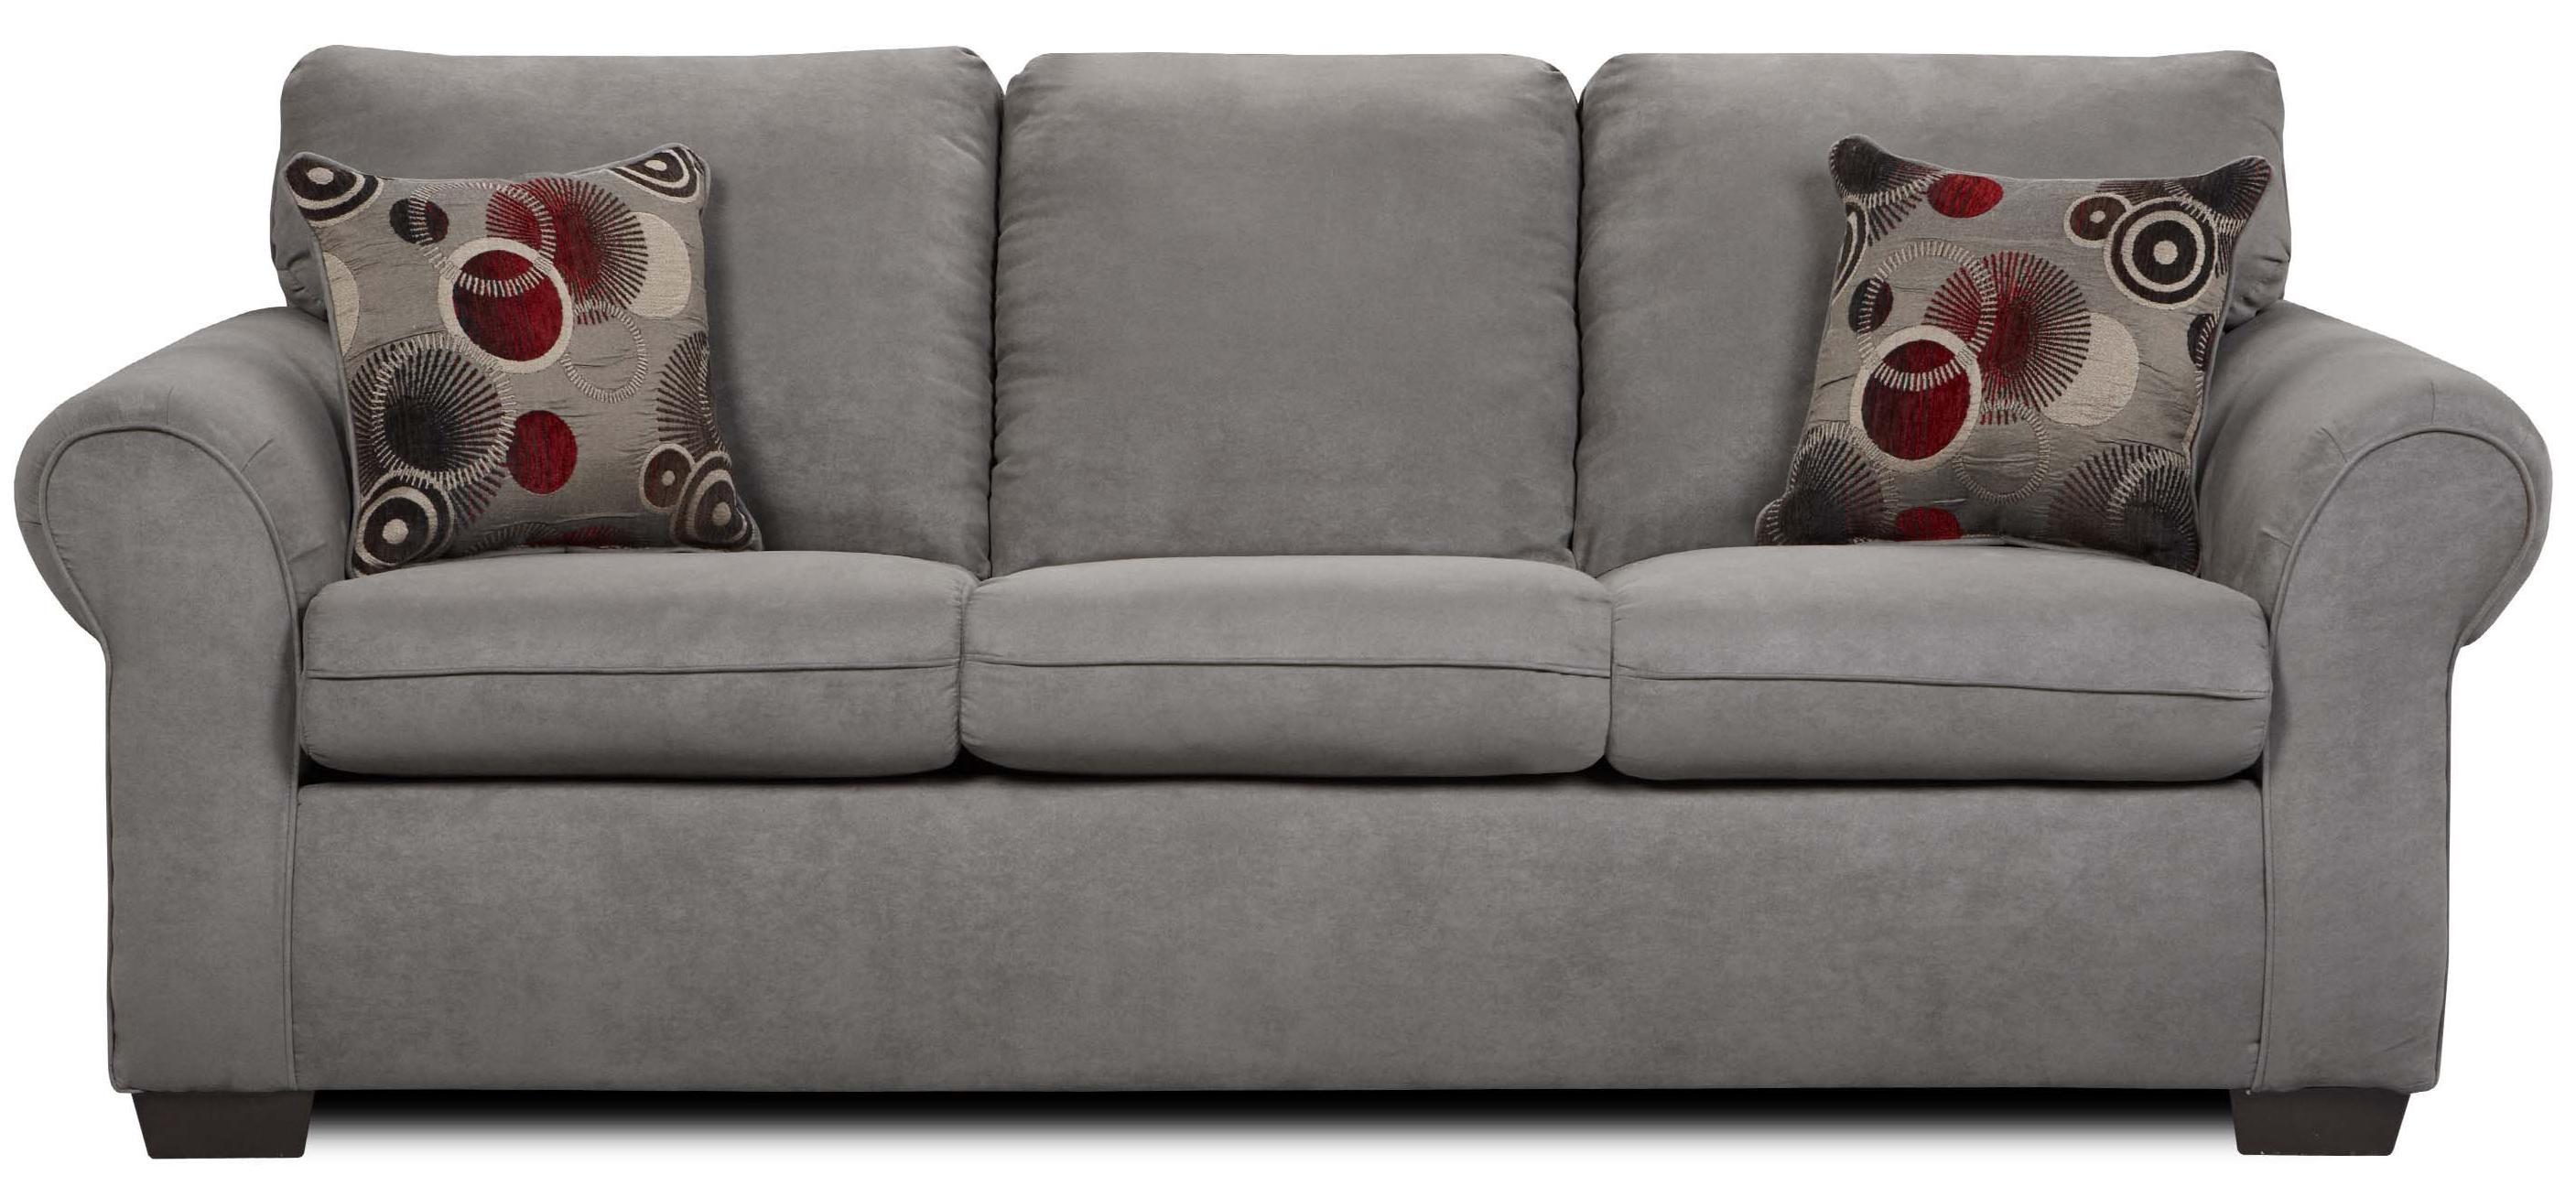 simmons upholstery 1640 queen sleeper sofa with exposed wood feet rh dunkandbright com simmons full sleeper sofa simmons upholstery sleeper sofa